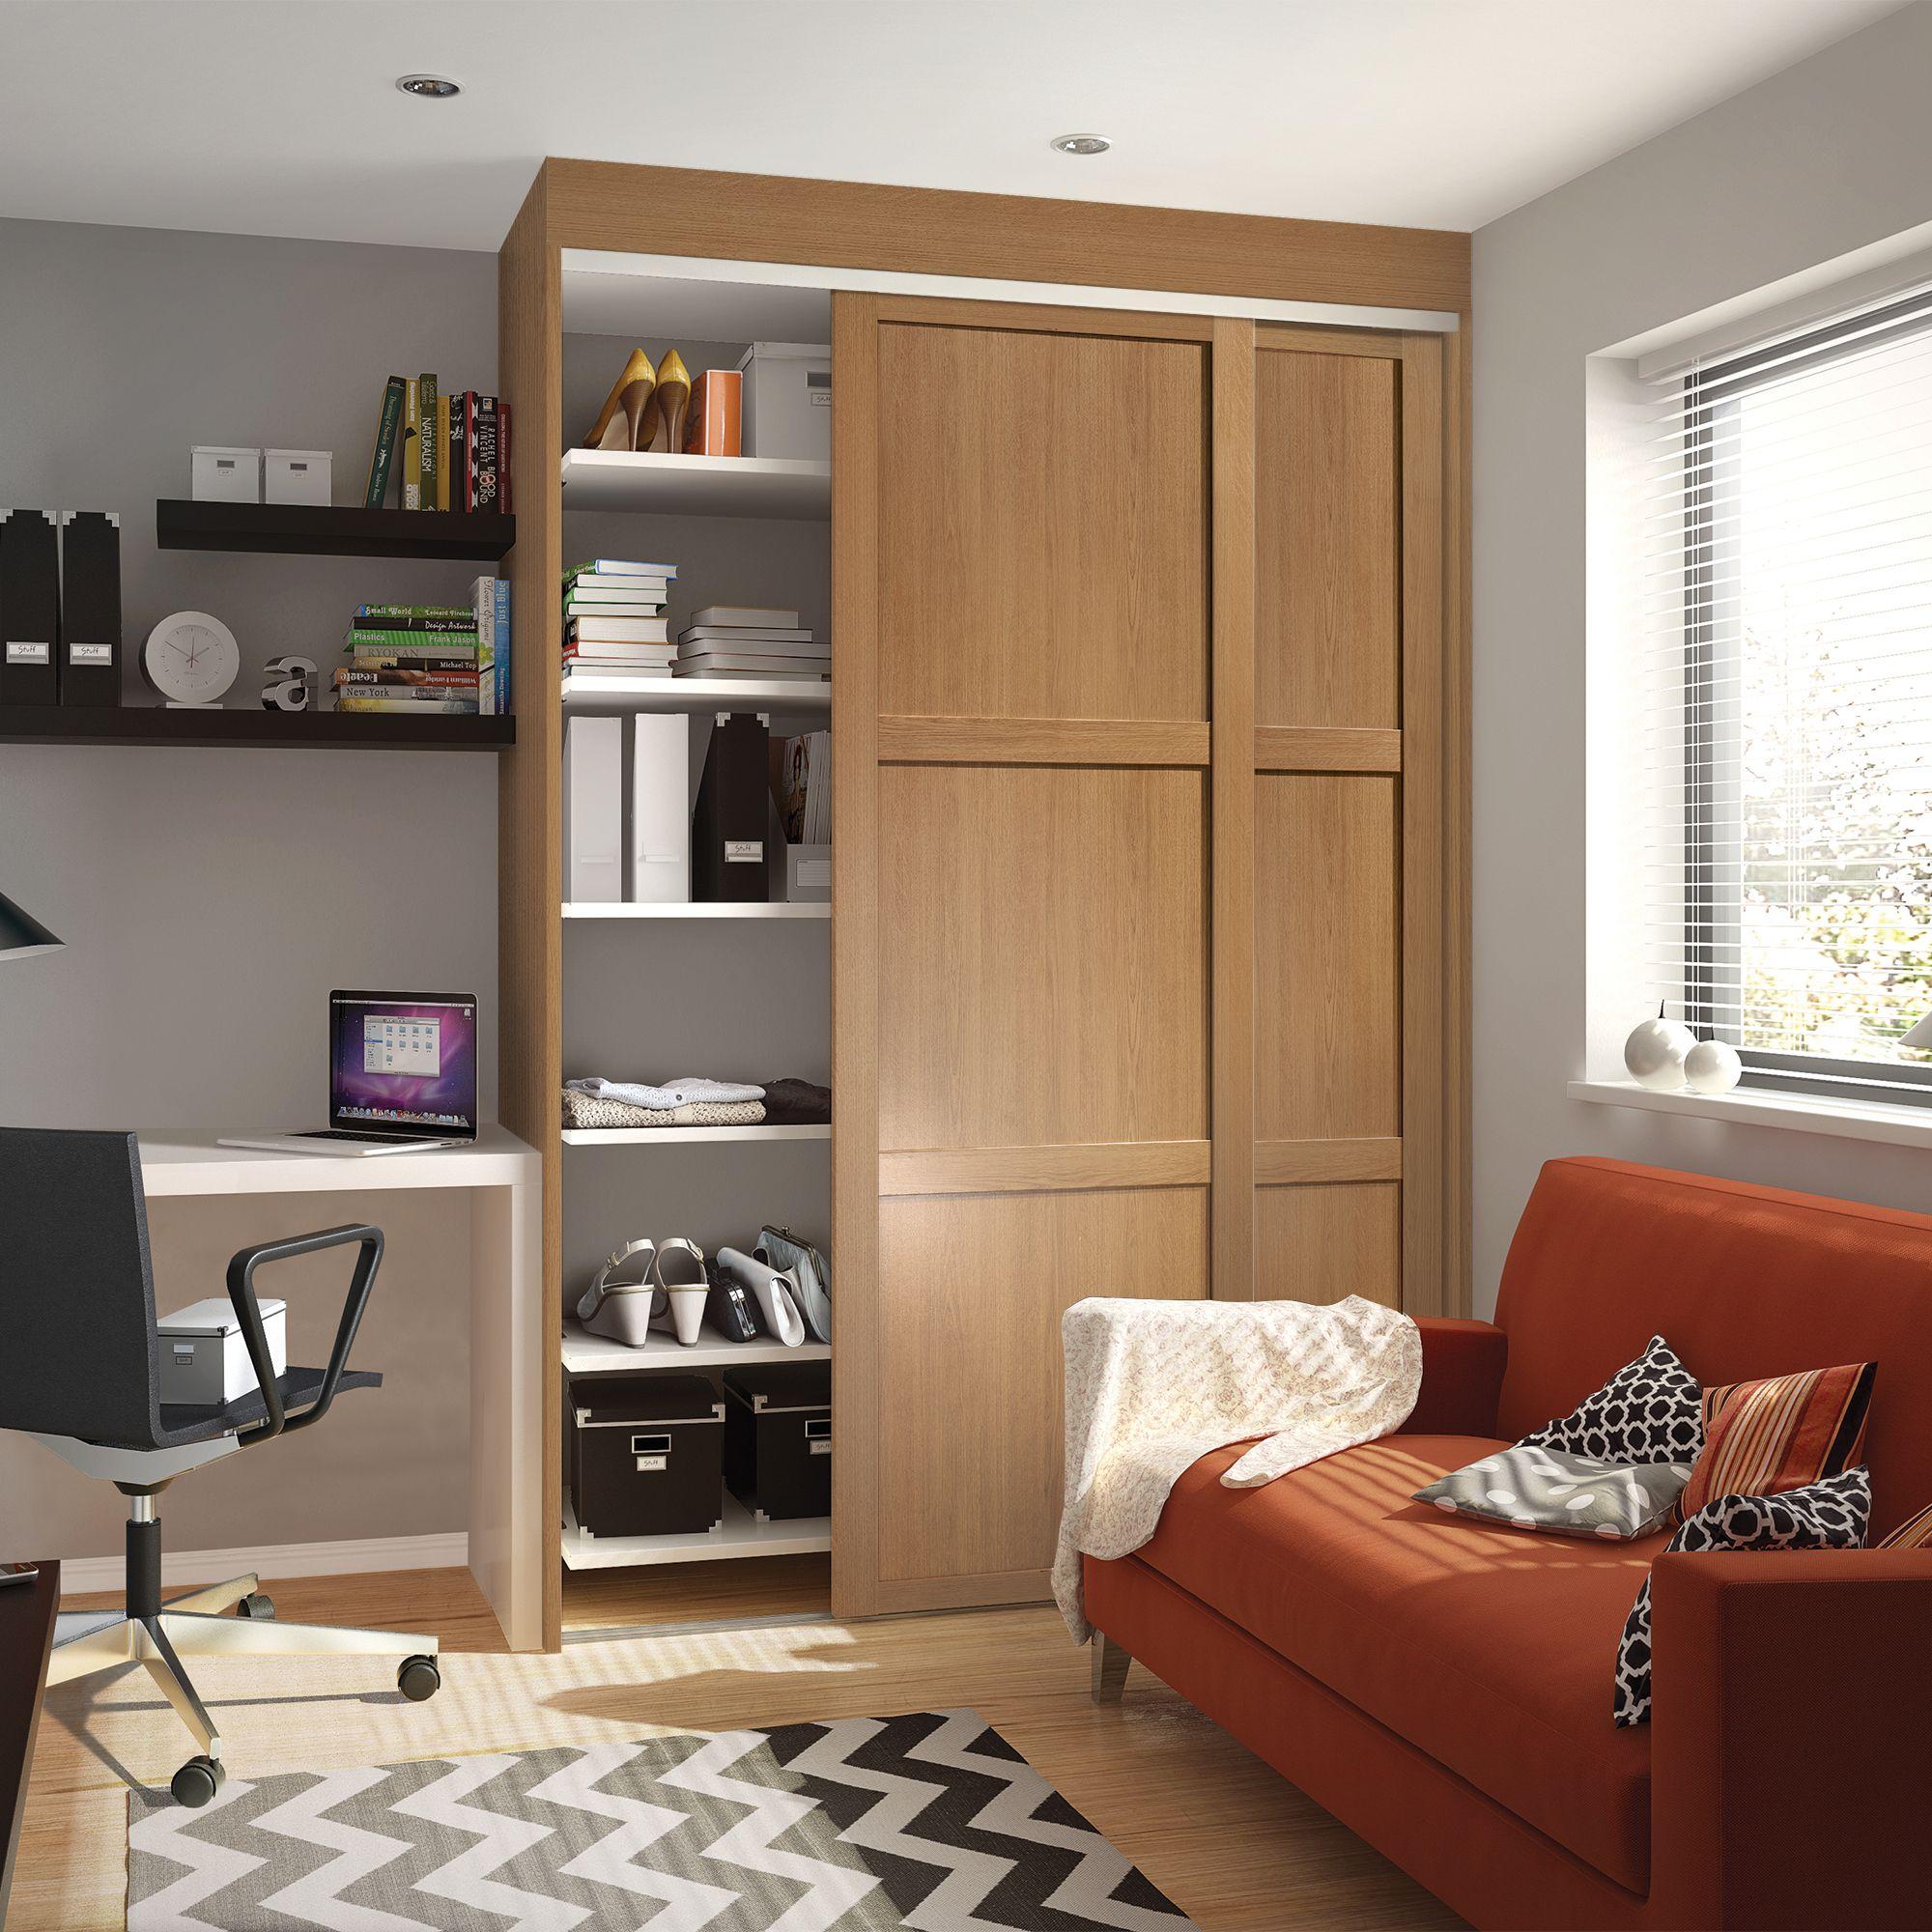 Shaker Single Doors & Sliding Wardrobe Doors u0026 Kits   Bedroom Furniture   DIY at Bu0026Q pezcame.com